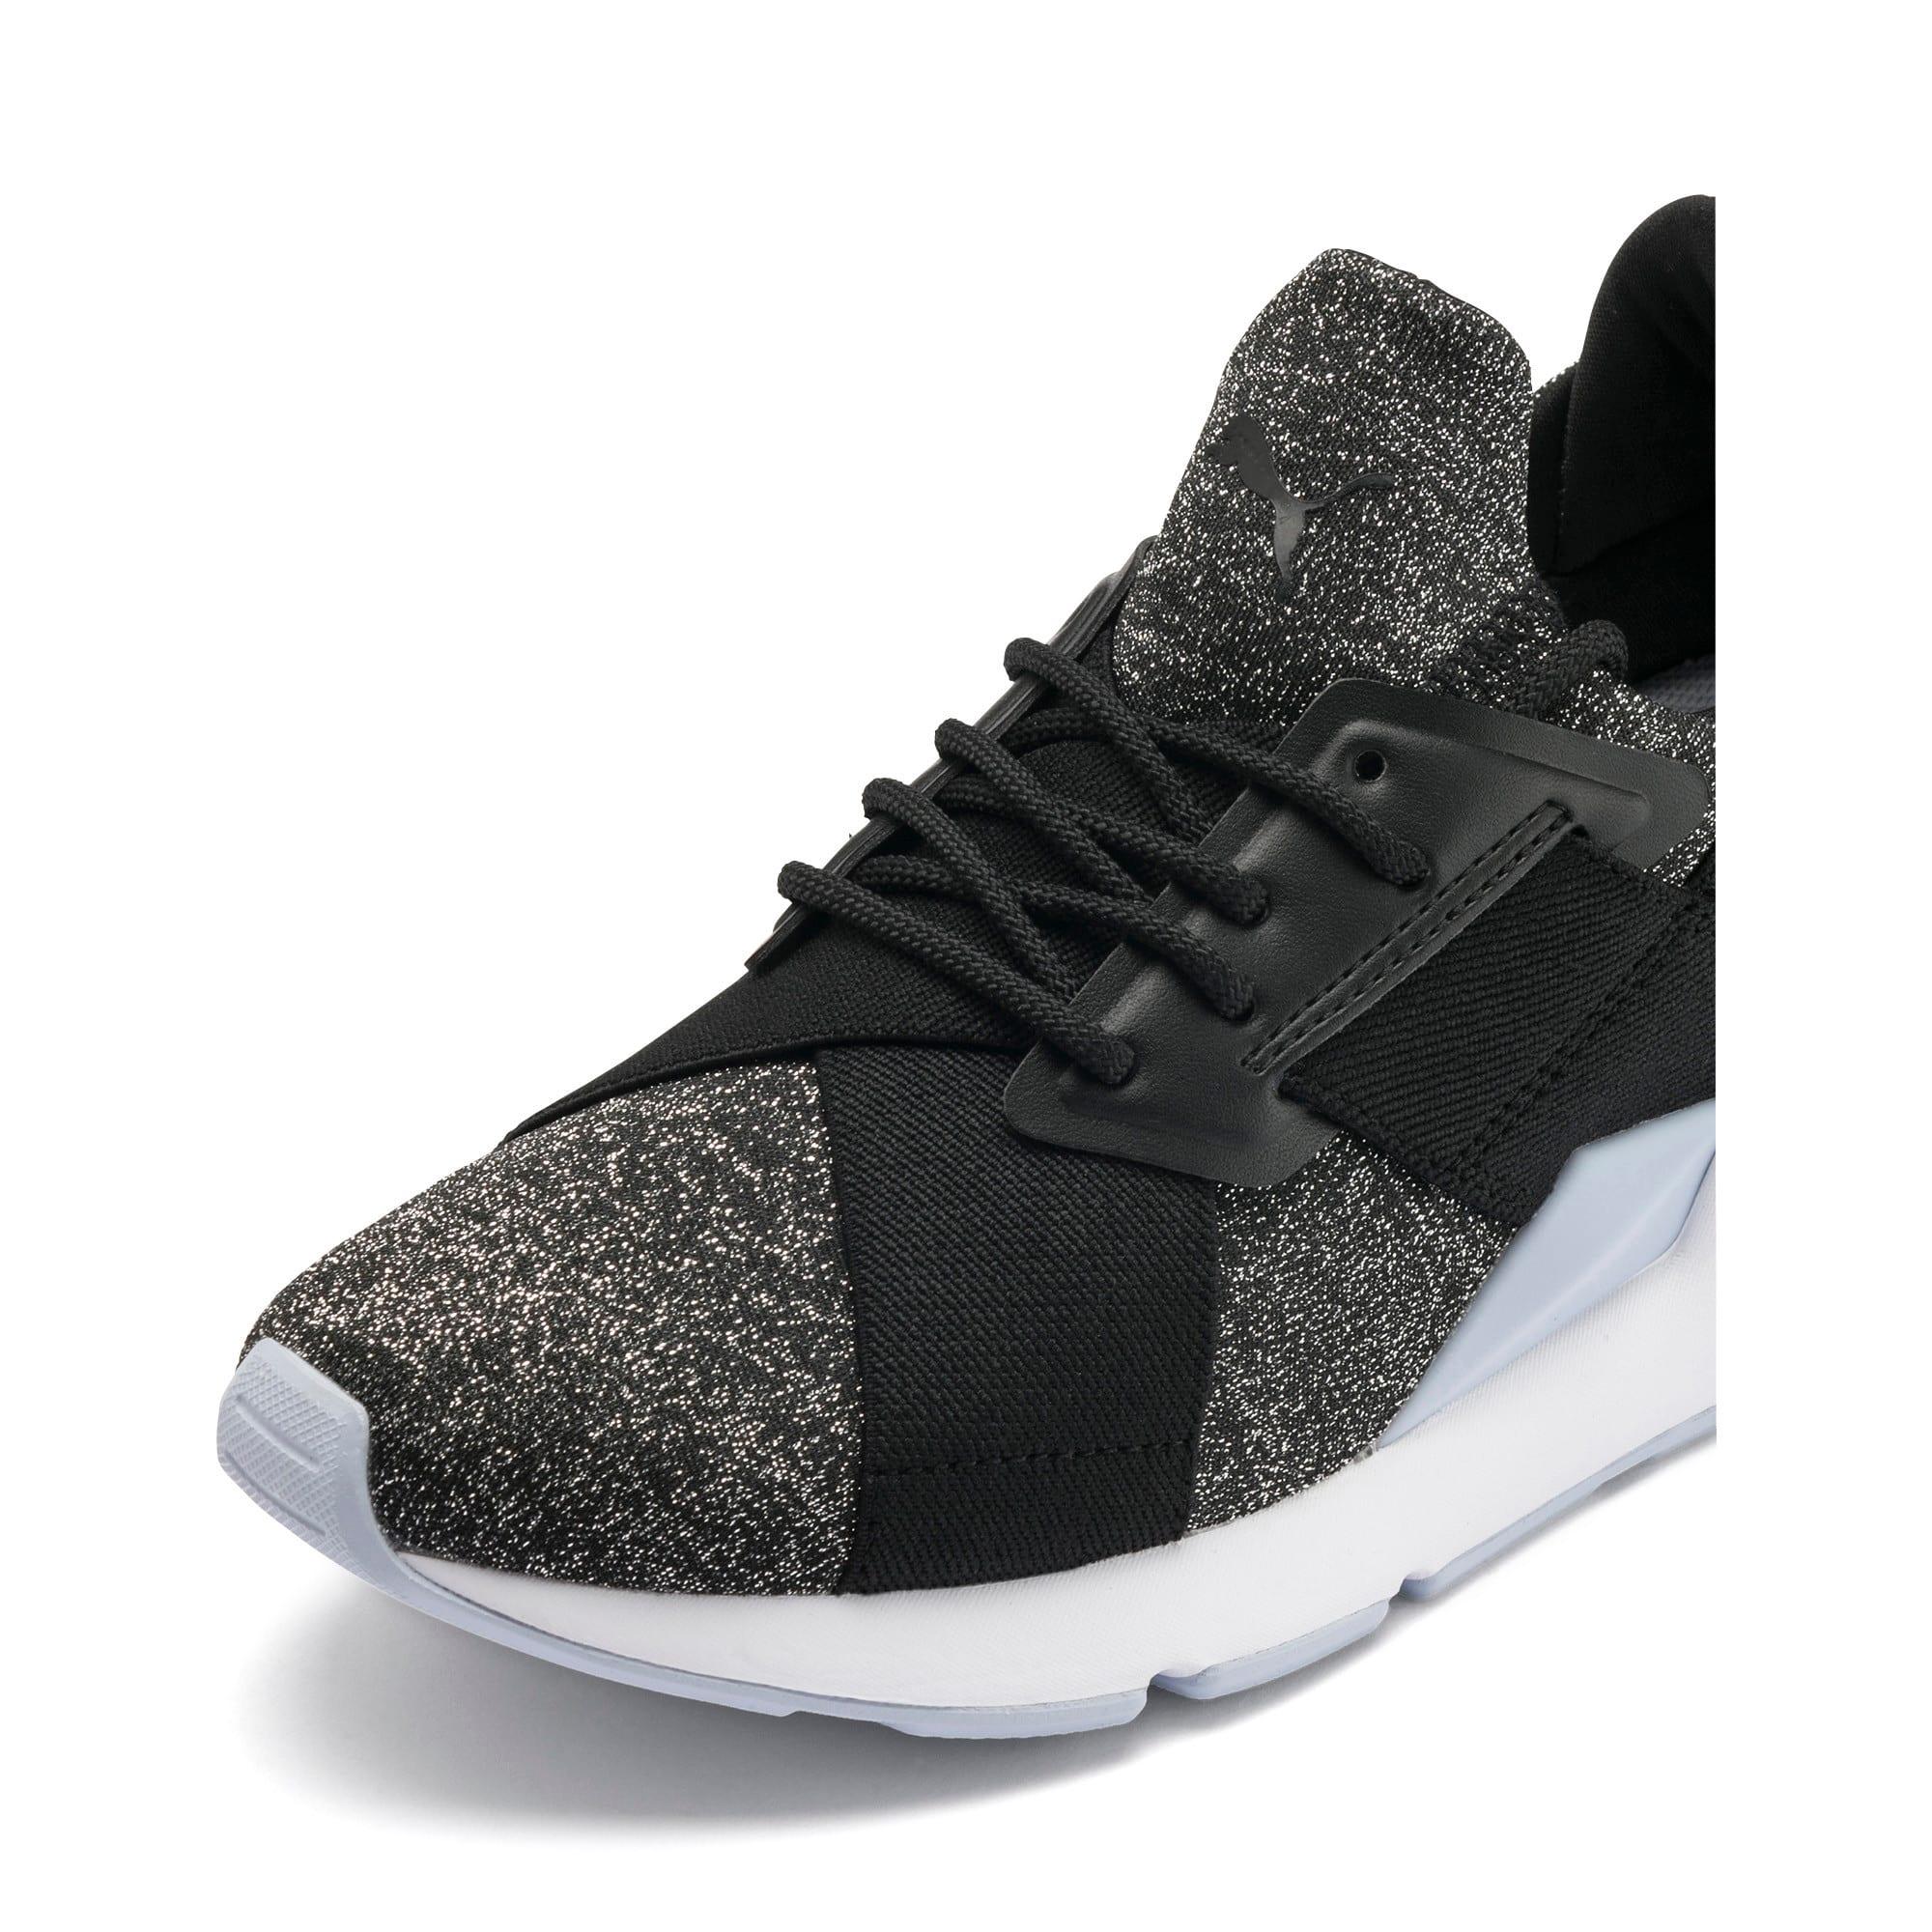 Thumbnail 7 of Muse Shift Sneakers JR, Puma Black-Heather, medium